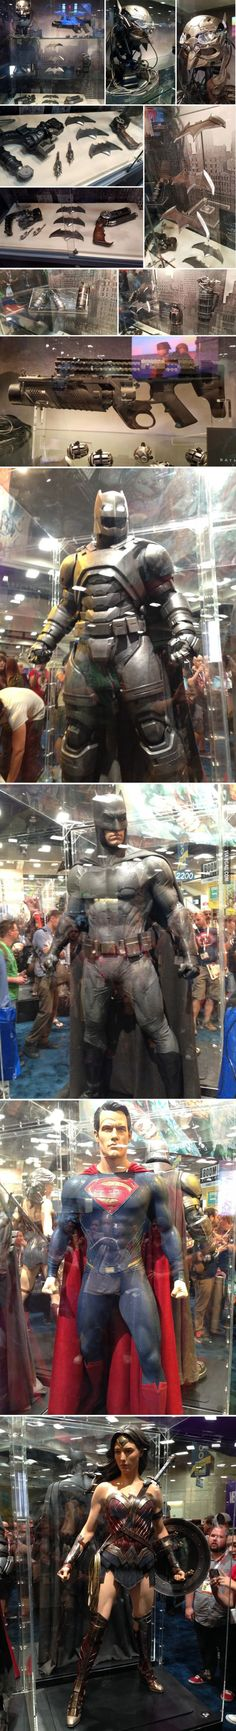 Comic Con 2015: The Dark Knight's Gadgets from 'Batman v. Superman'